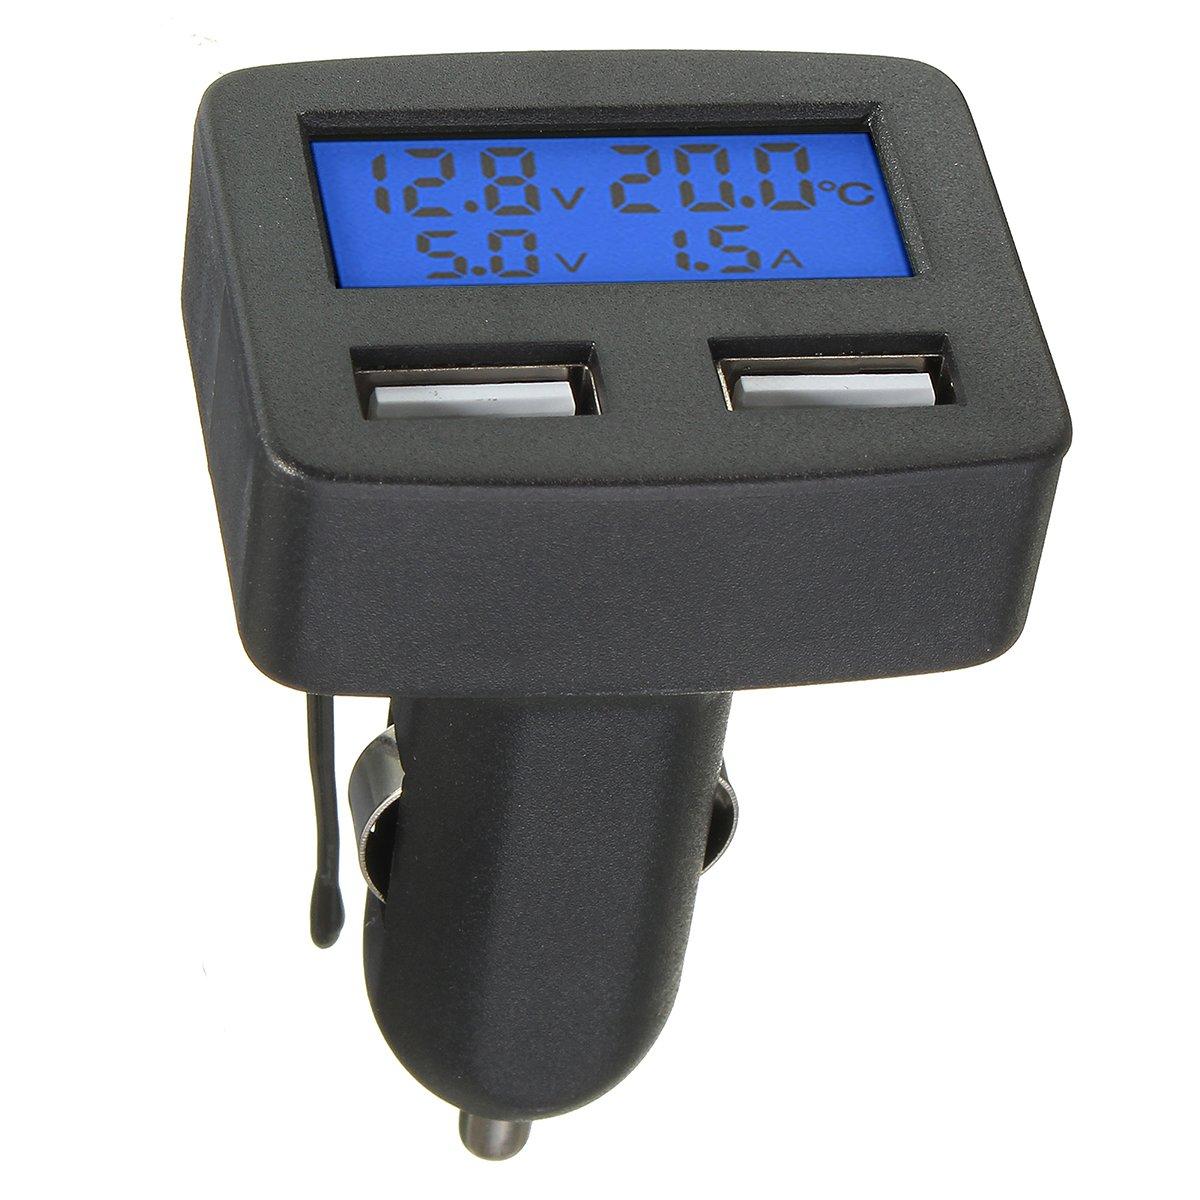 FeLiCia 12 V 24 V Universal Dual USB Schnittstelle Auto Ladeger/ät Mit Voltmeter Amperemeter Thermometer LCD Display